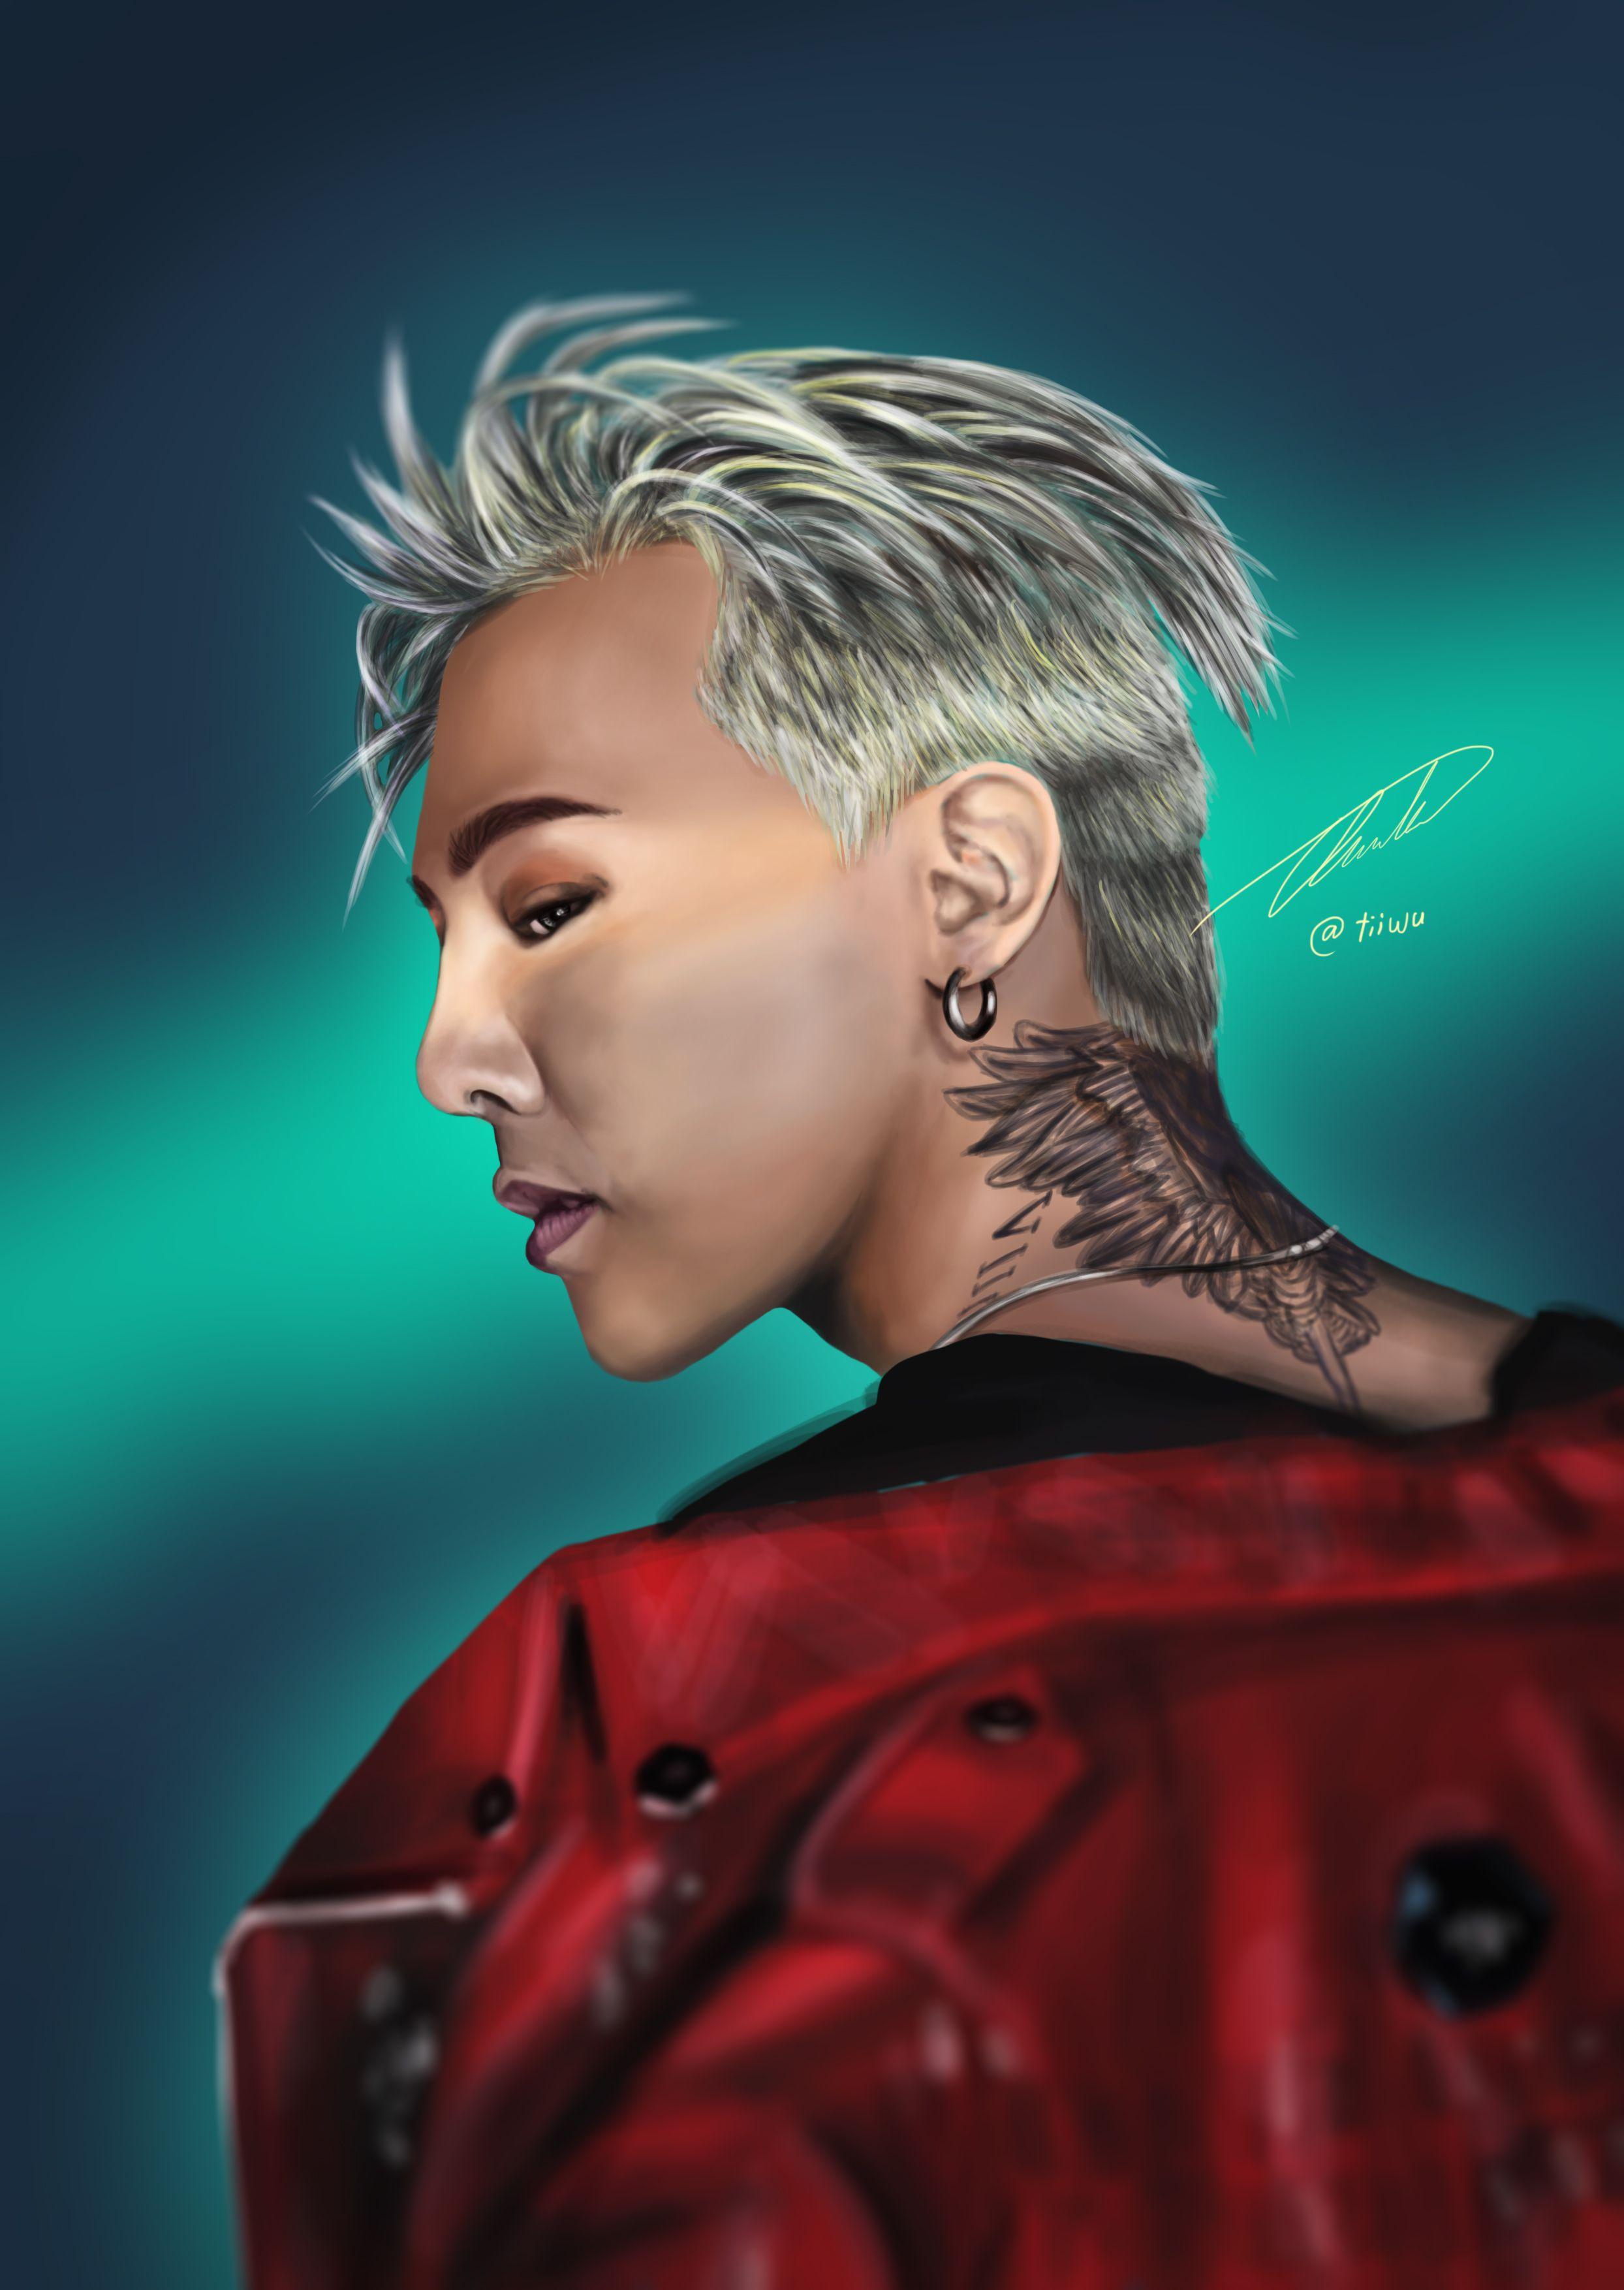 69ceb4da8 G-Dragon BIGBANG | tiiwu in 2019 | Dragon art, G dragon, Bigbang